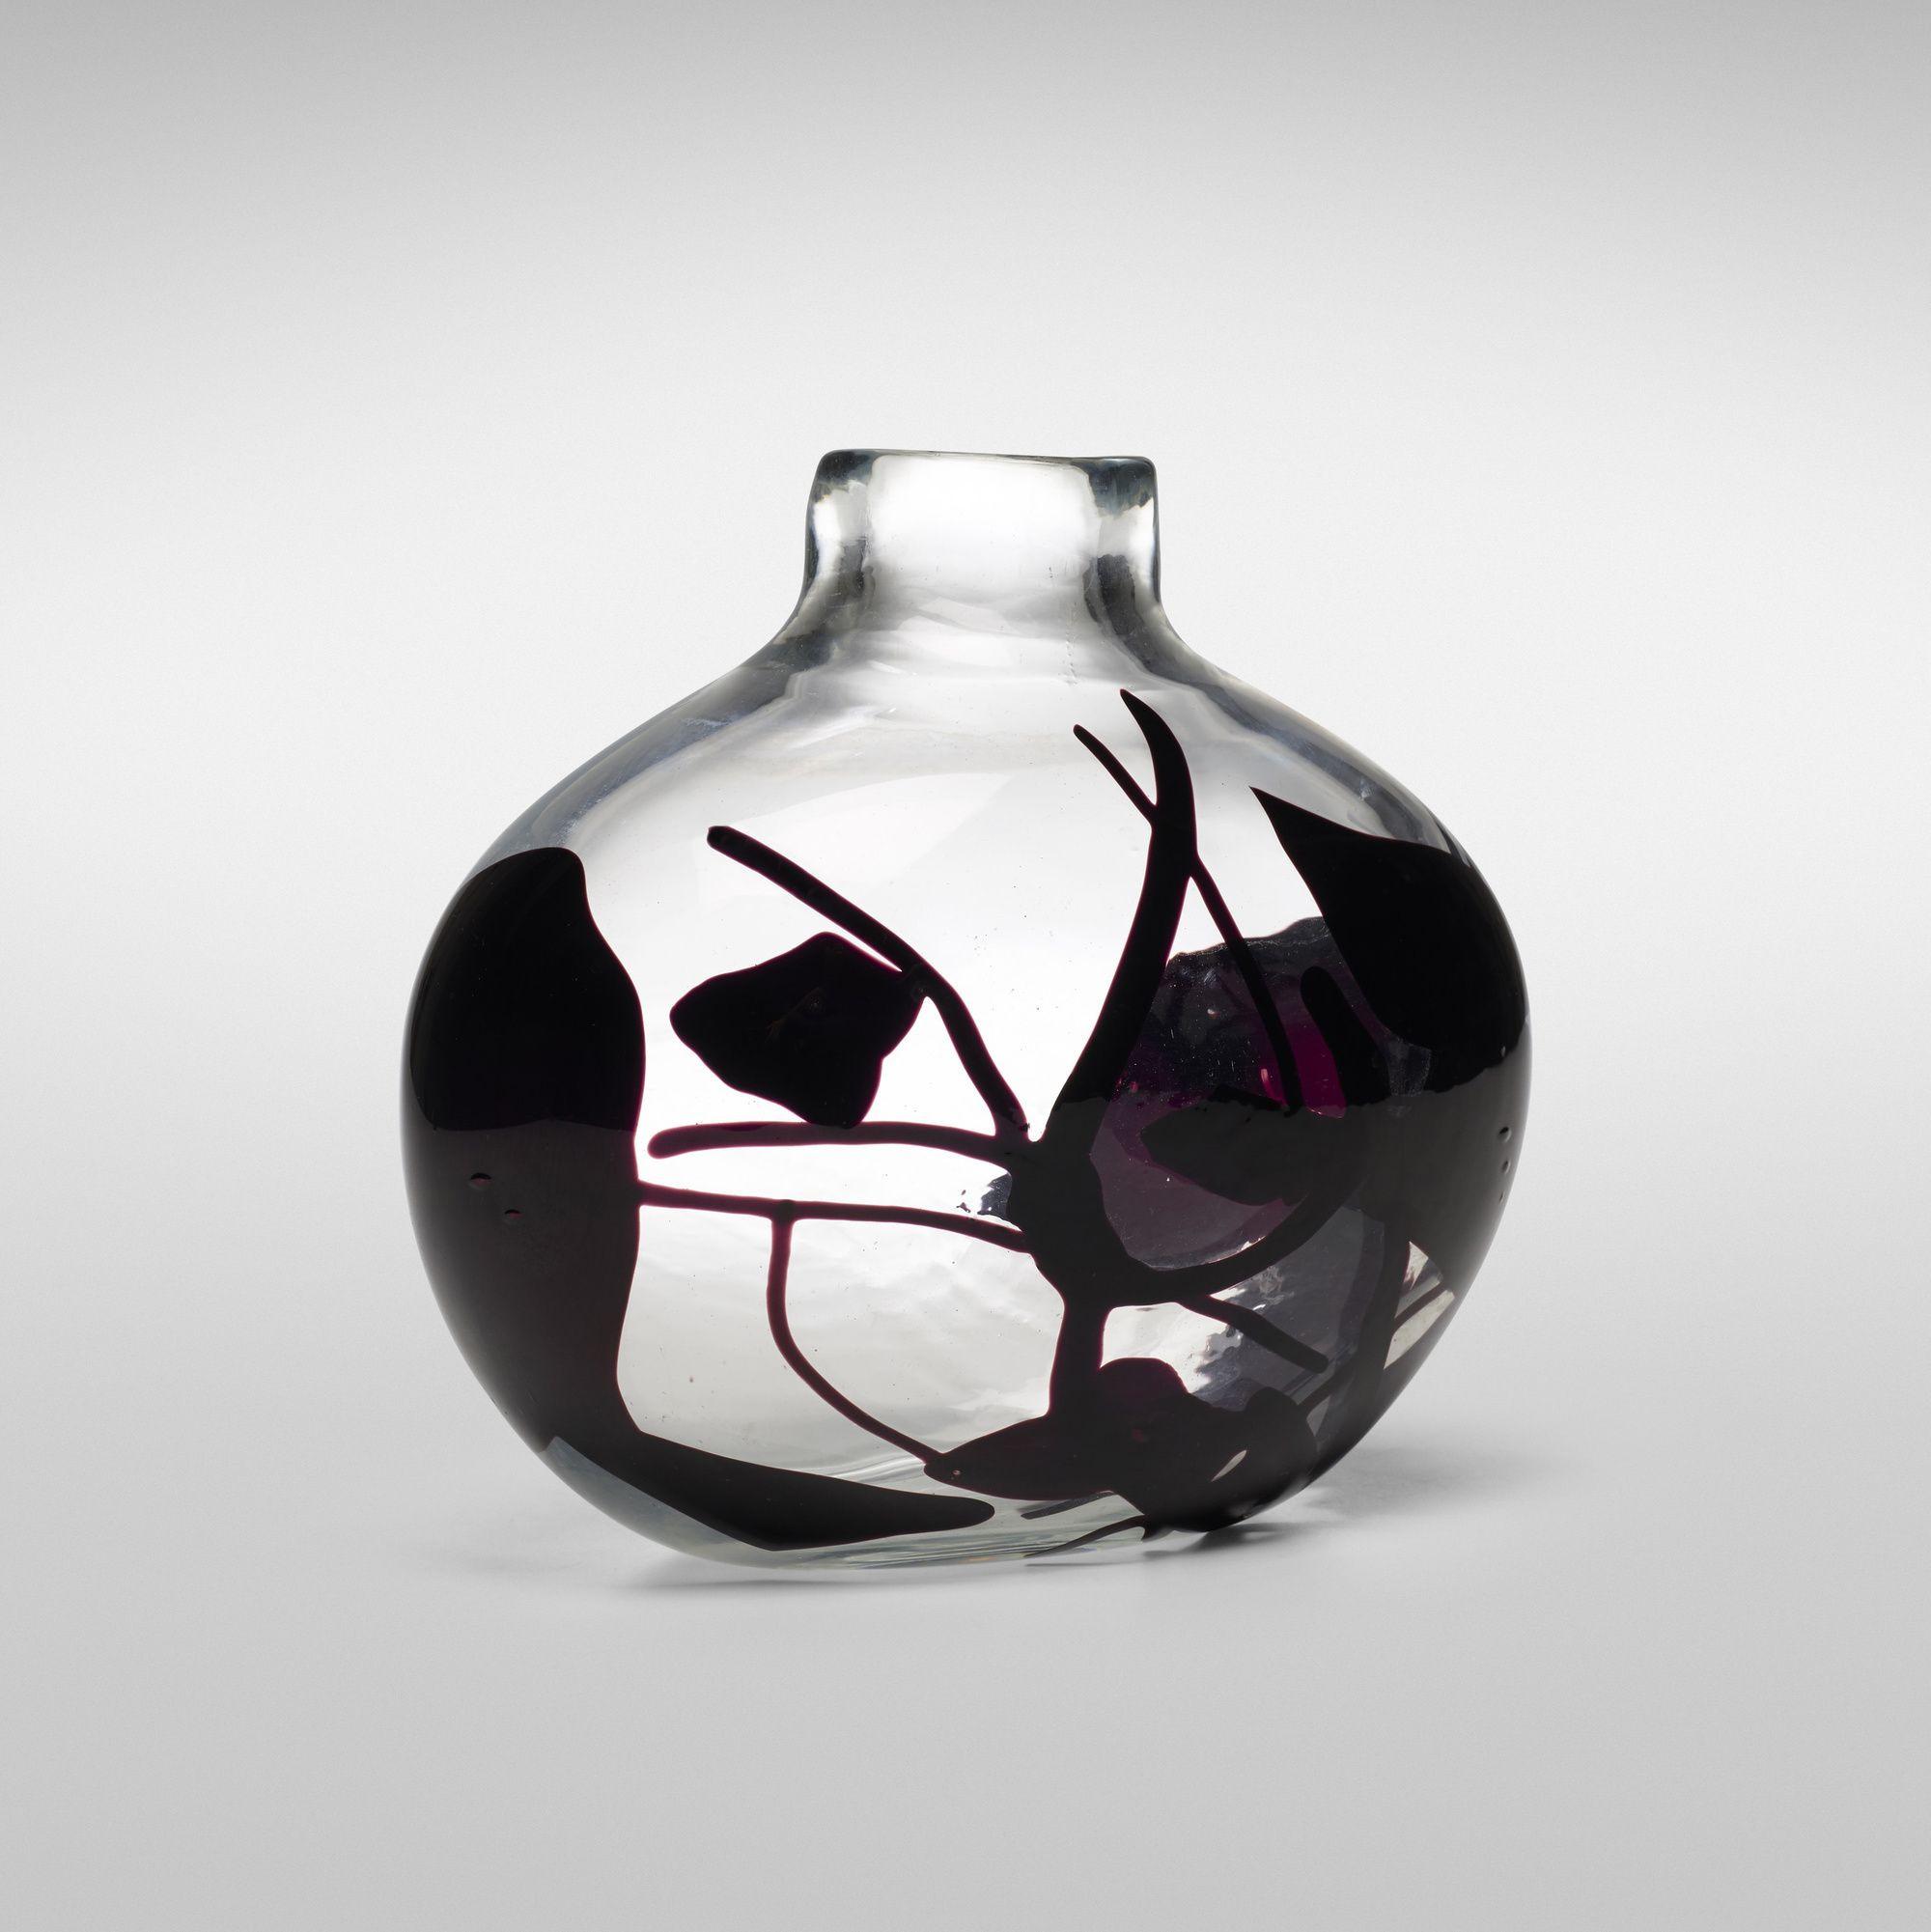 Soccer Ball Vase Of 19 Vase Art Competition 2018 the Weekly World Pertaining to 139 Fulvio Bianconi Important Con Macchie Vase Model 4324